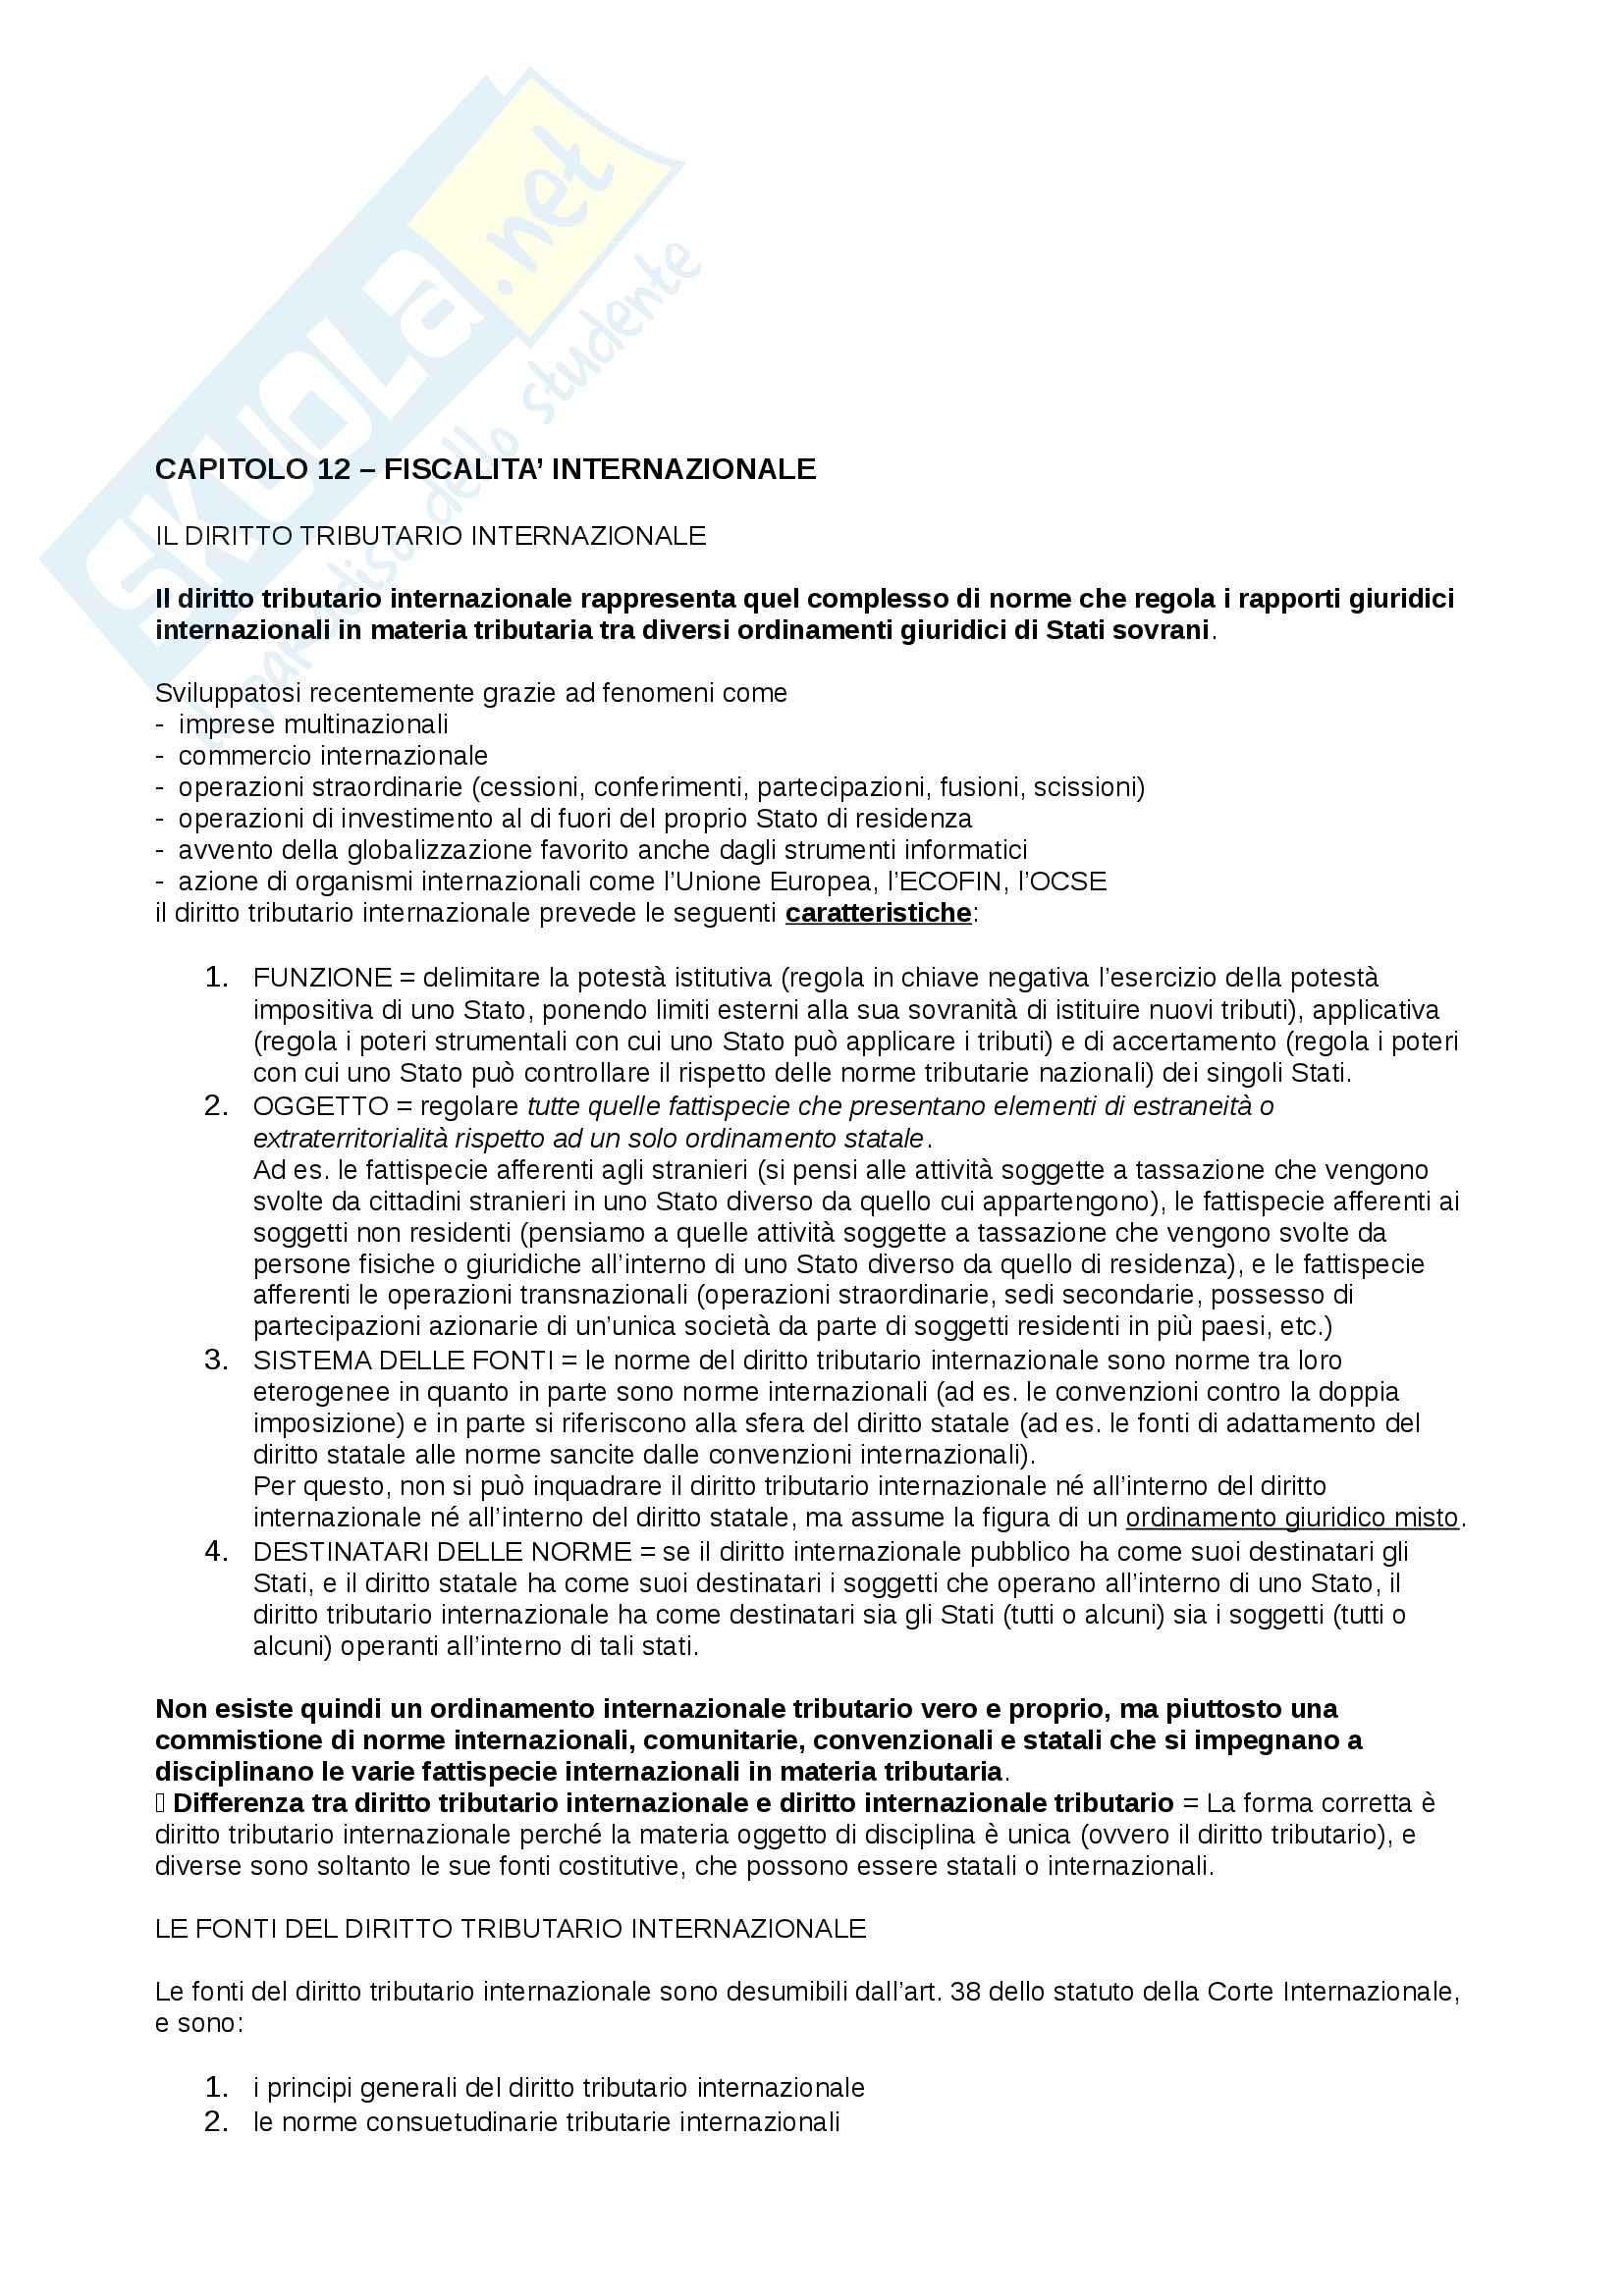 Appunti Diritto tributario d'impresa, prof. Giorgi Pag. 56